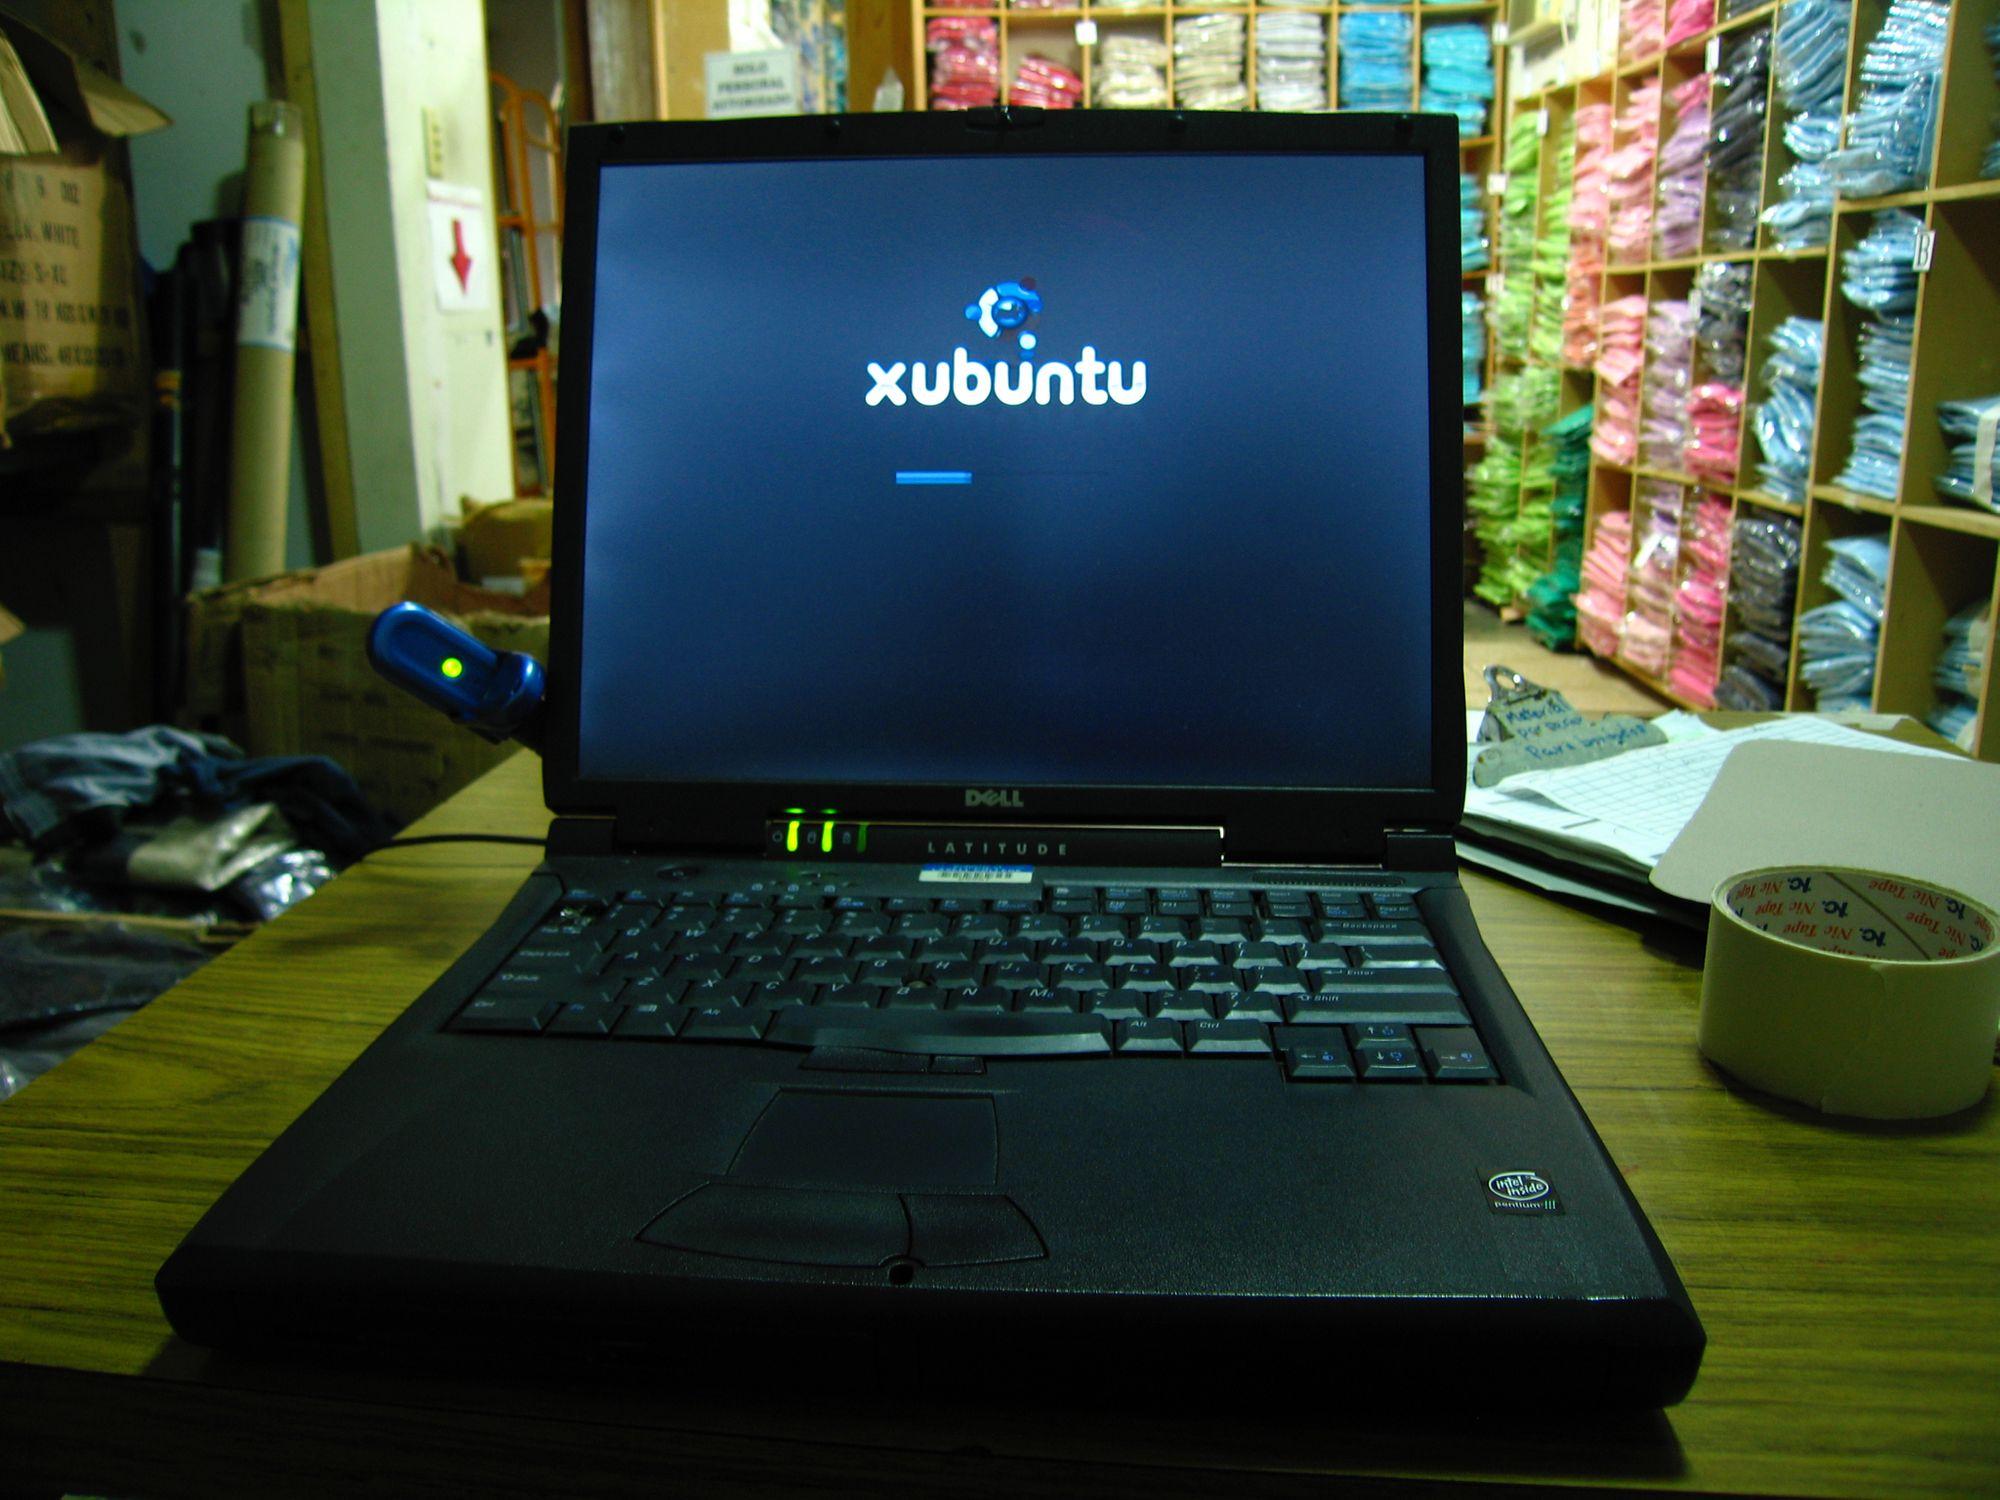 A computer sitting on a desk booting into Xubuntu